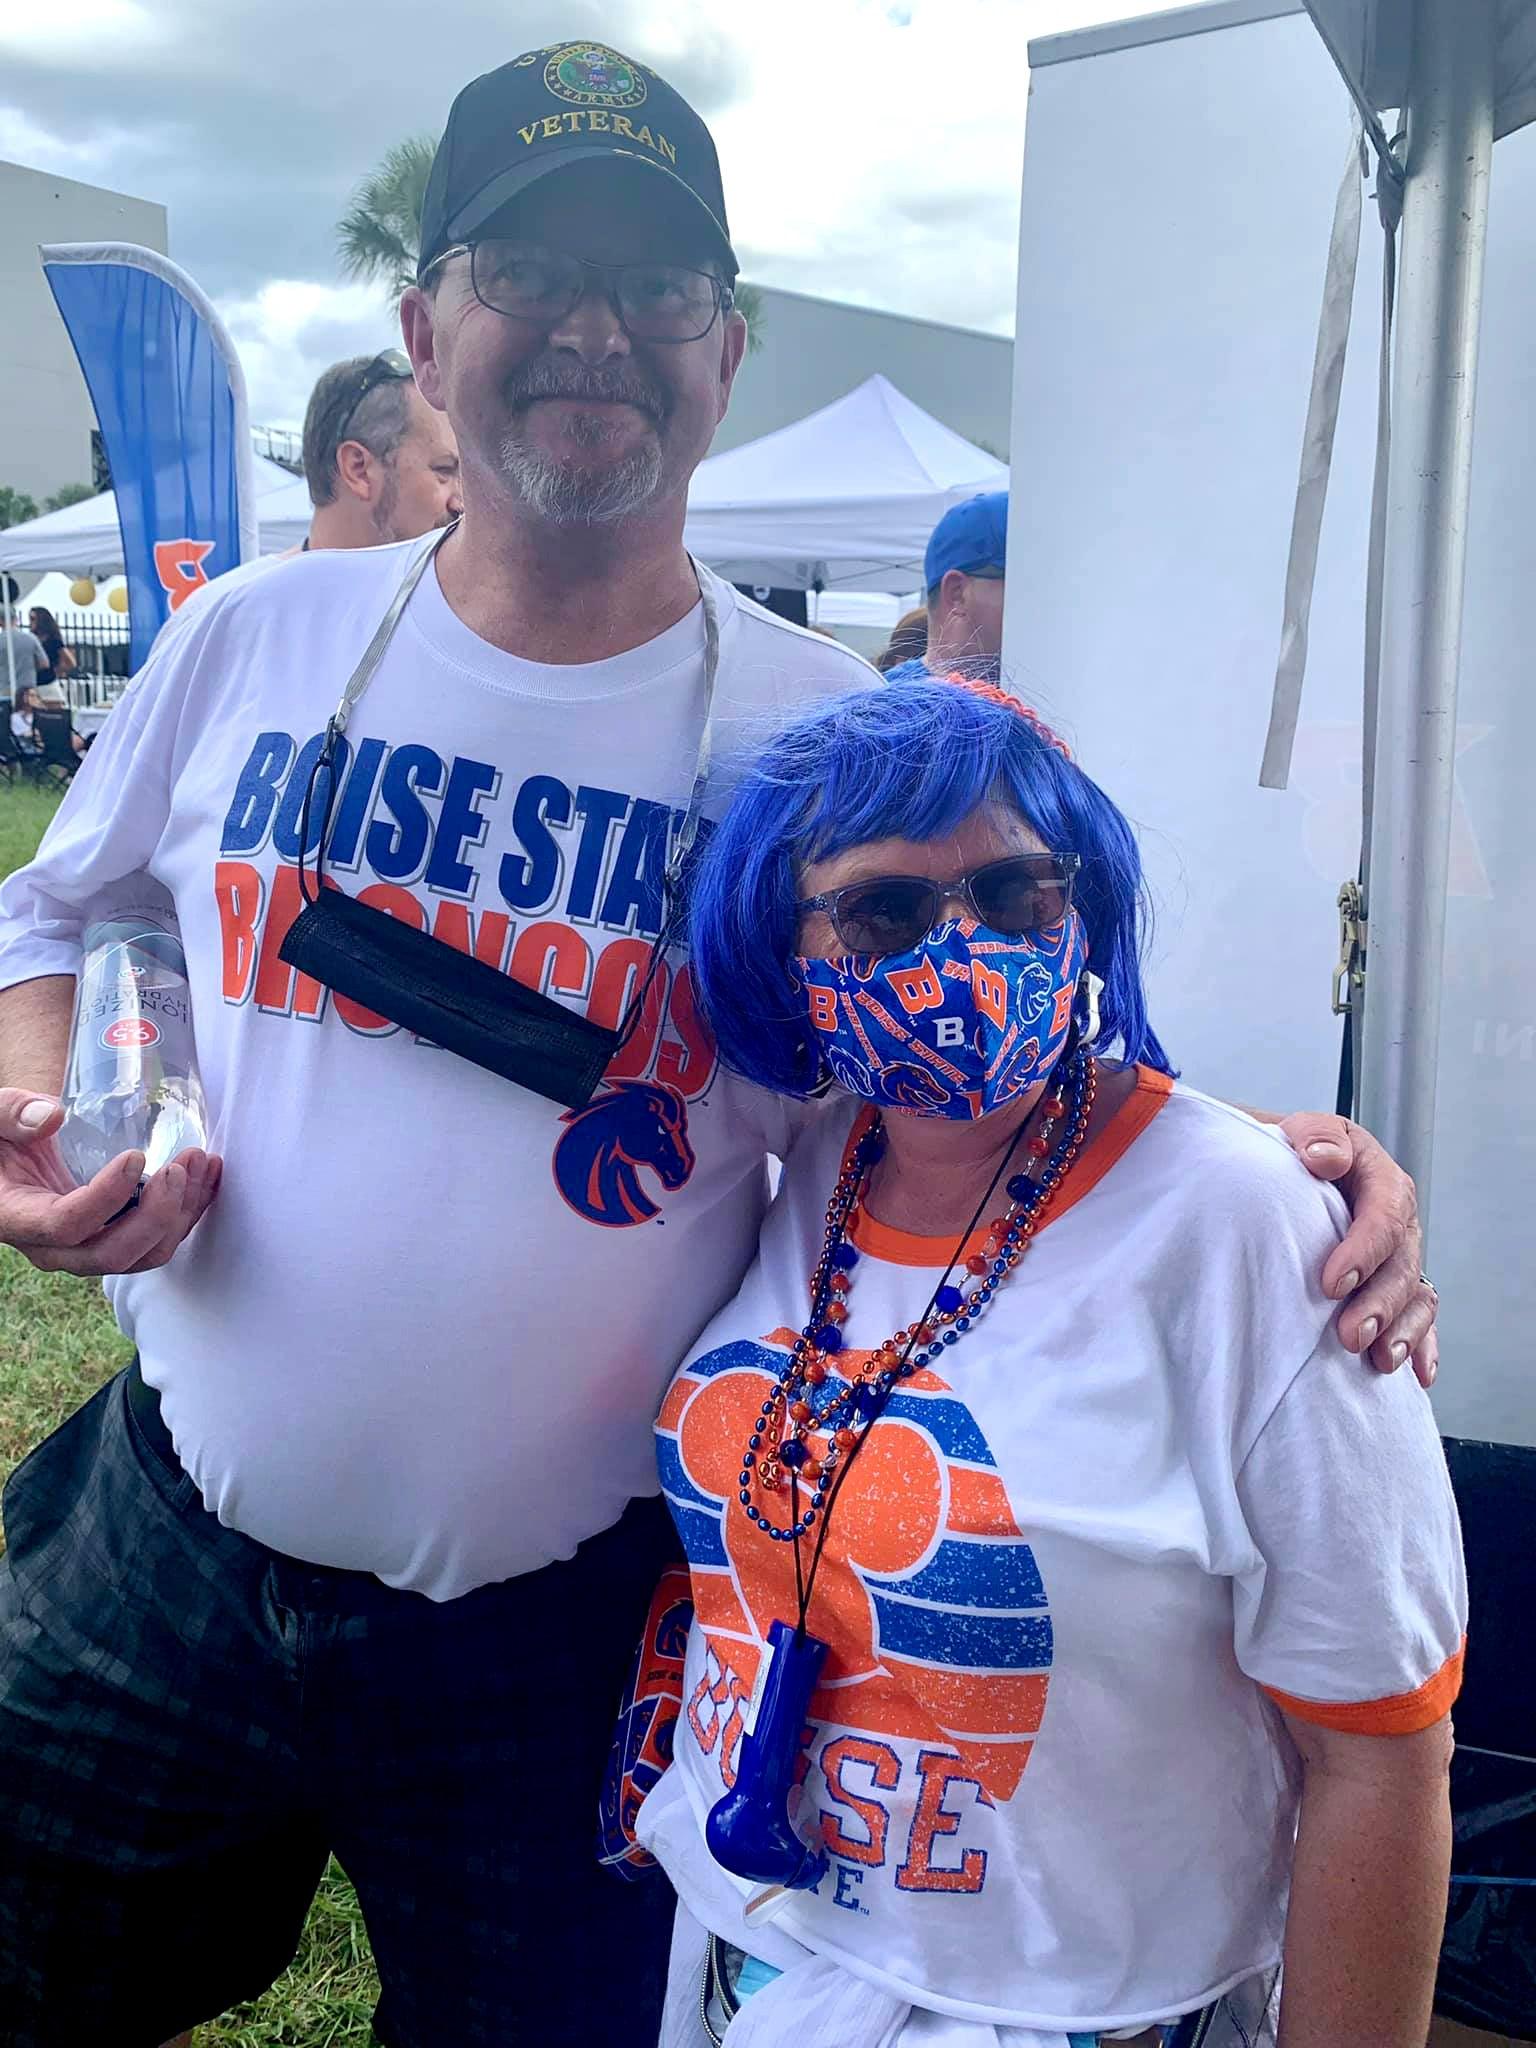 Boise State fans at Bronco Bash